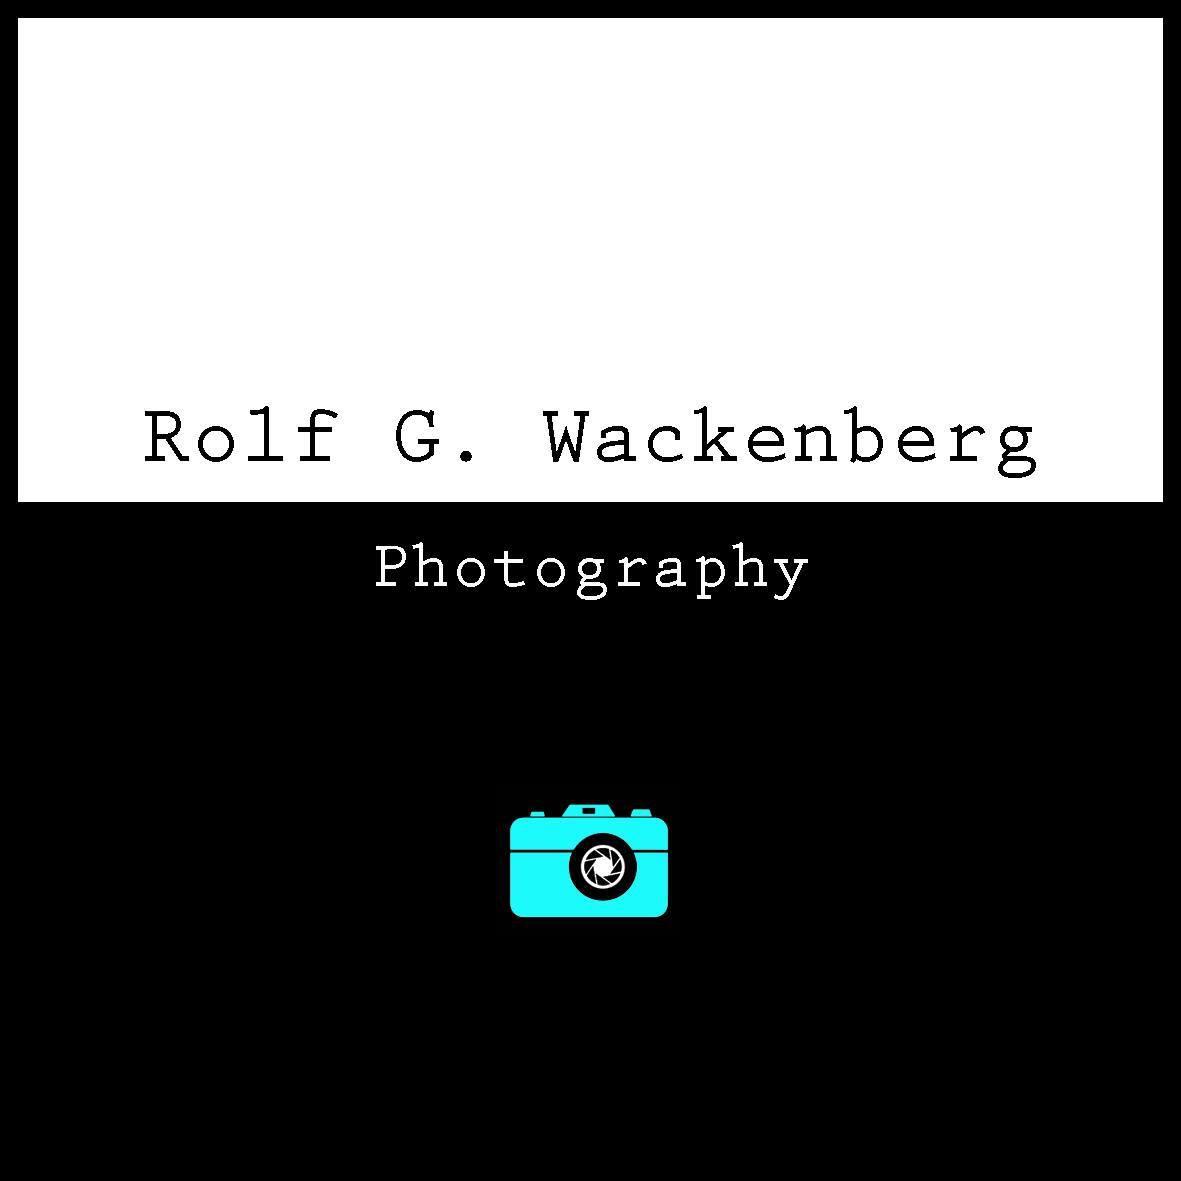 Rolf G. Wackenberg